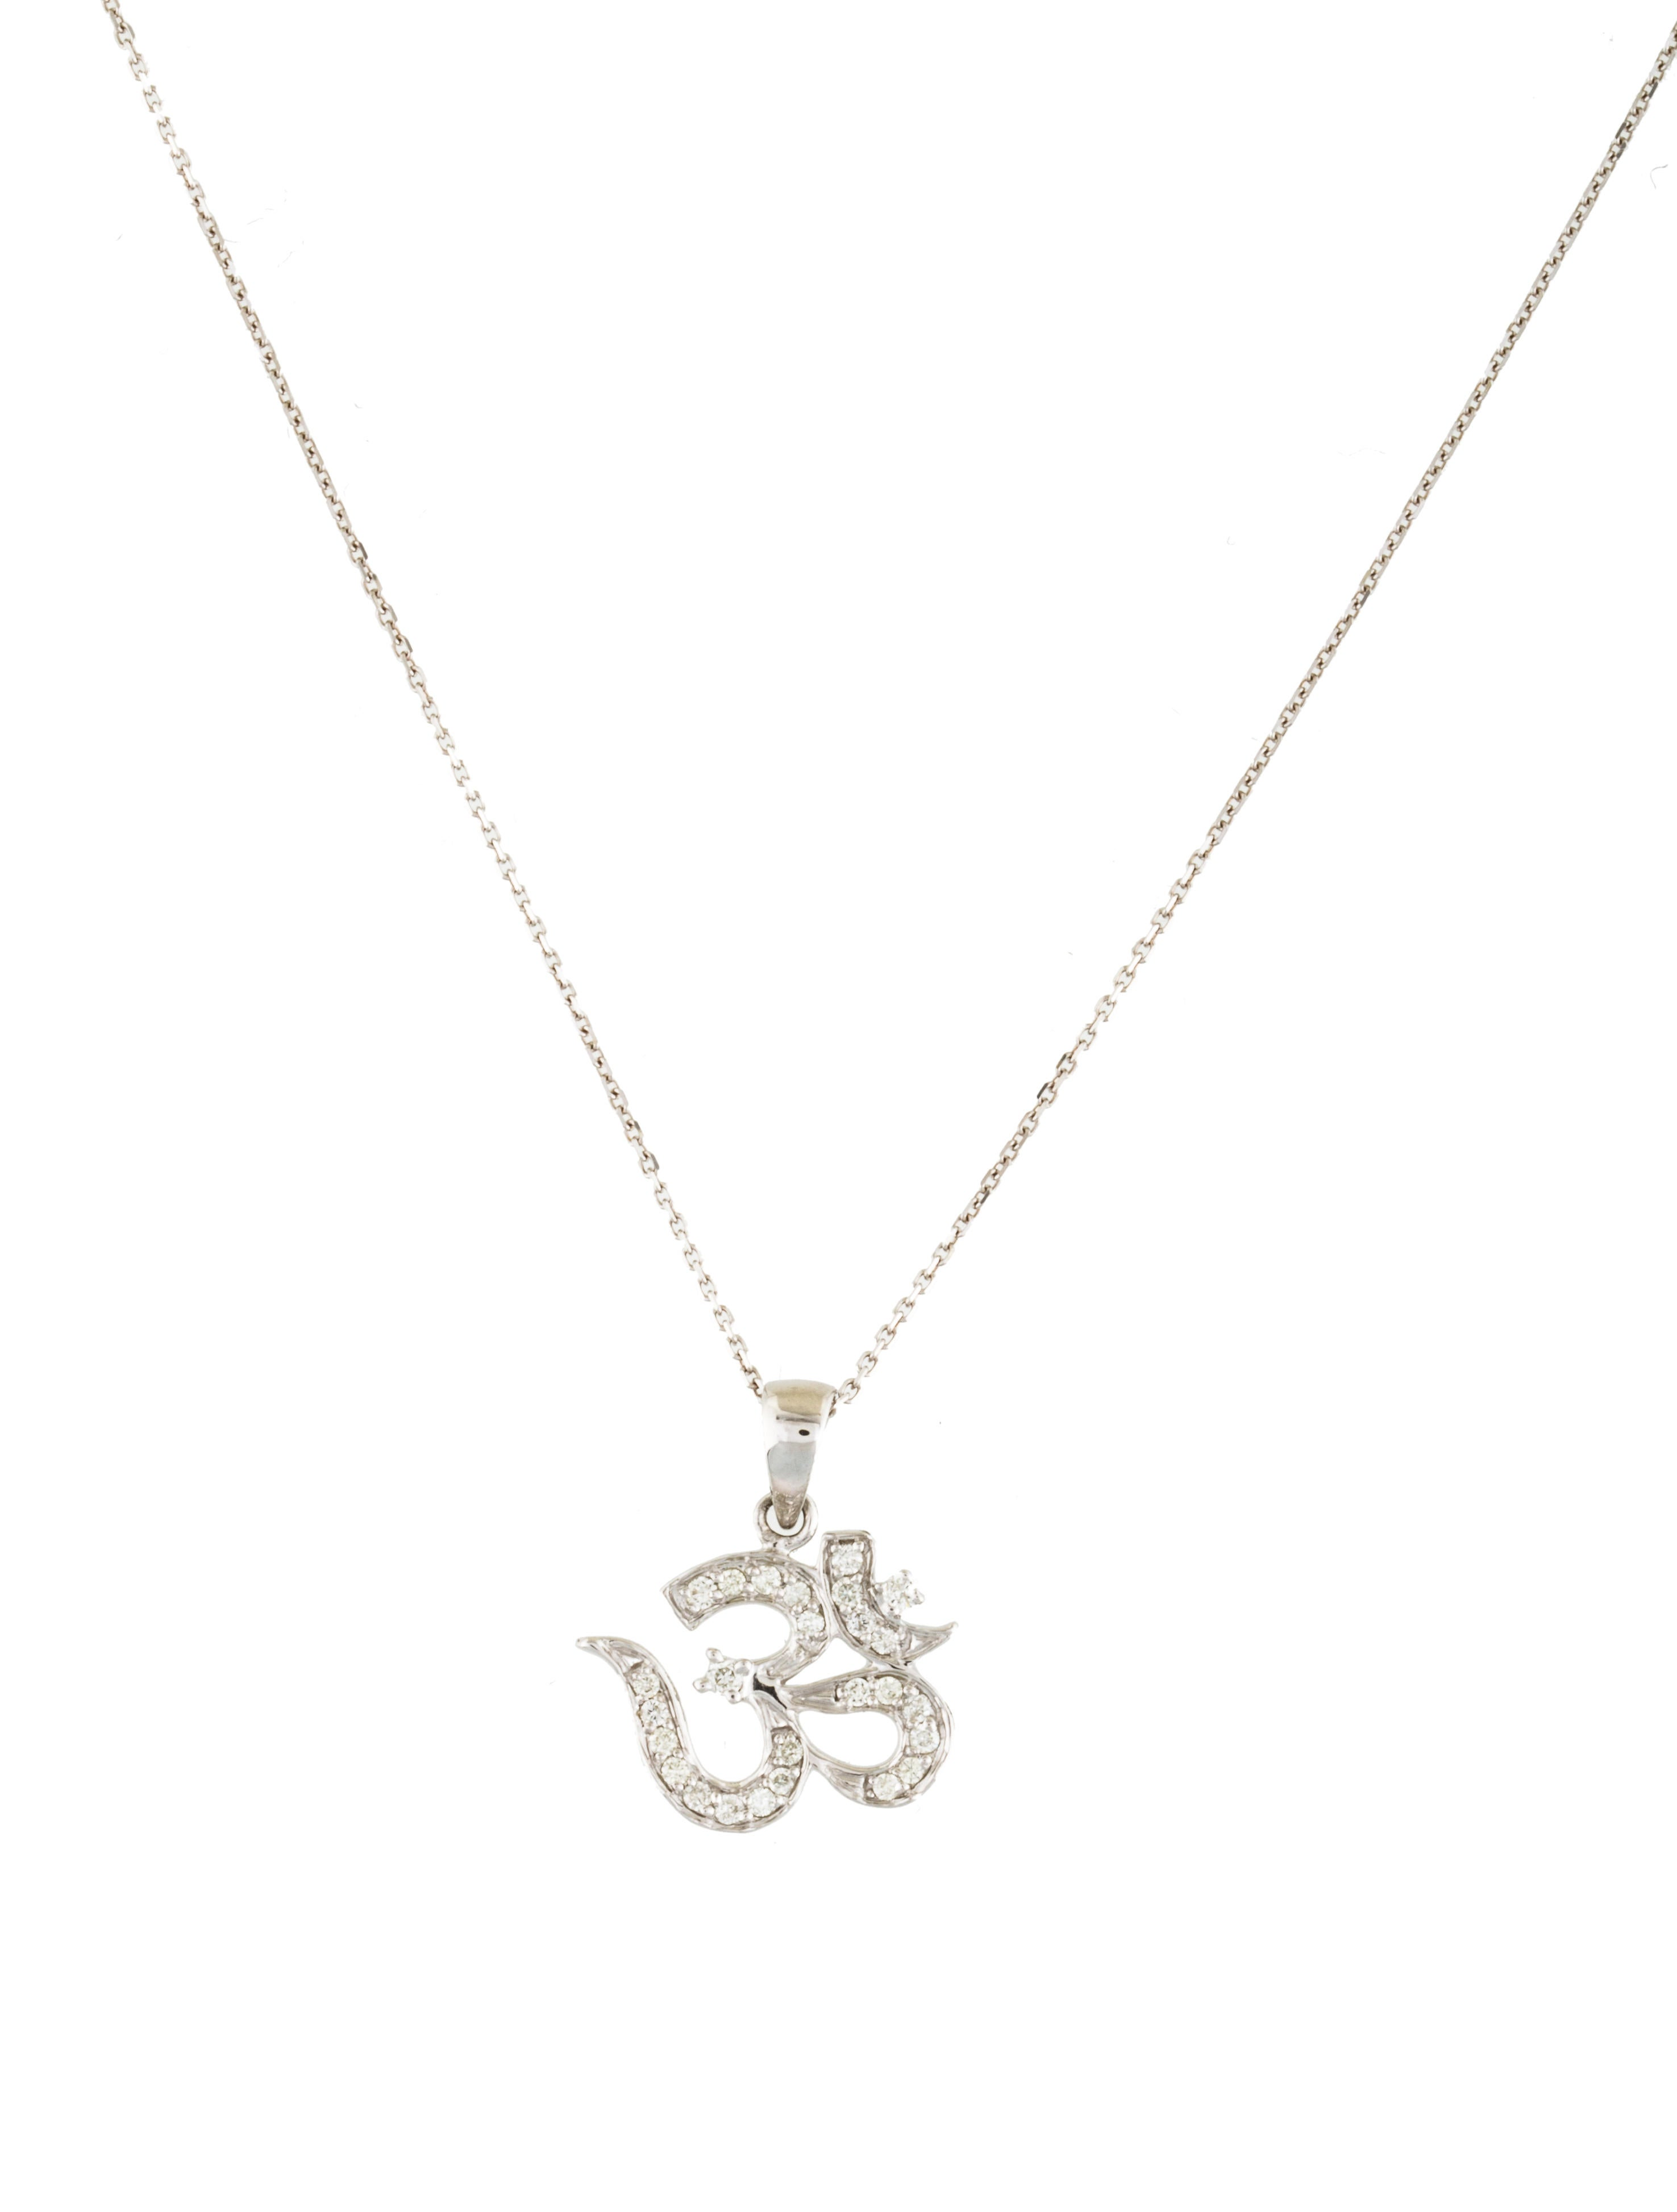 14k om pendant necklace necklaces neckl29679